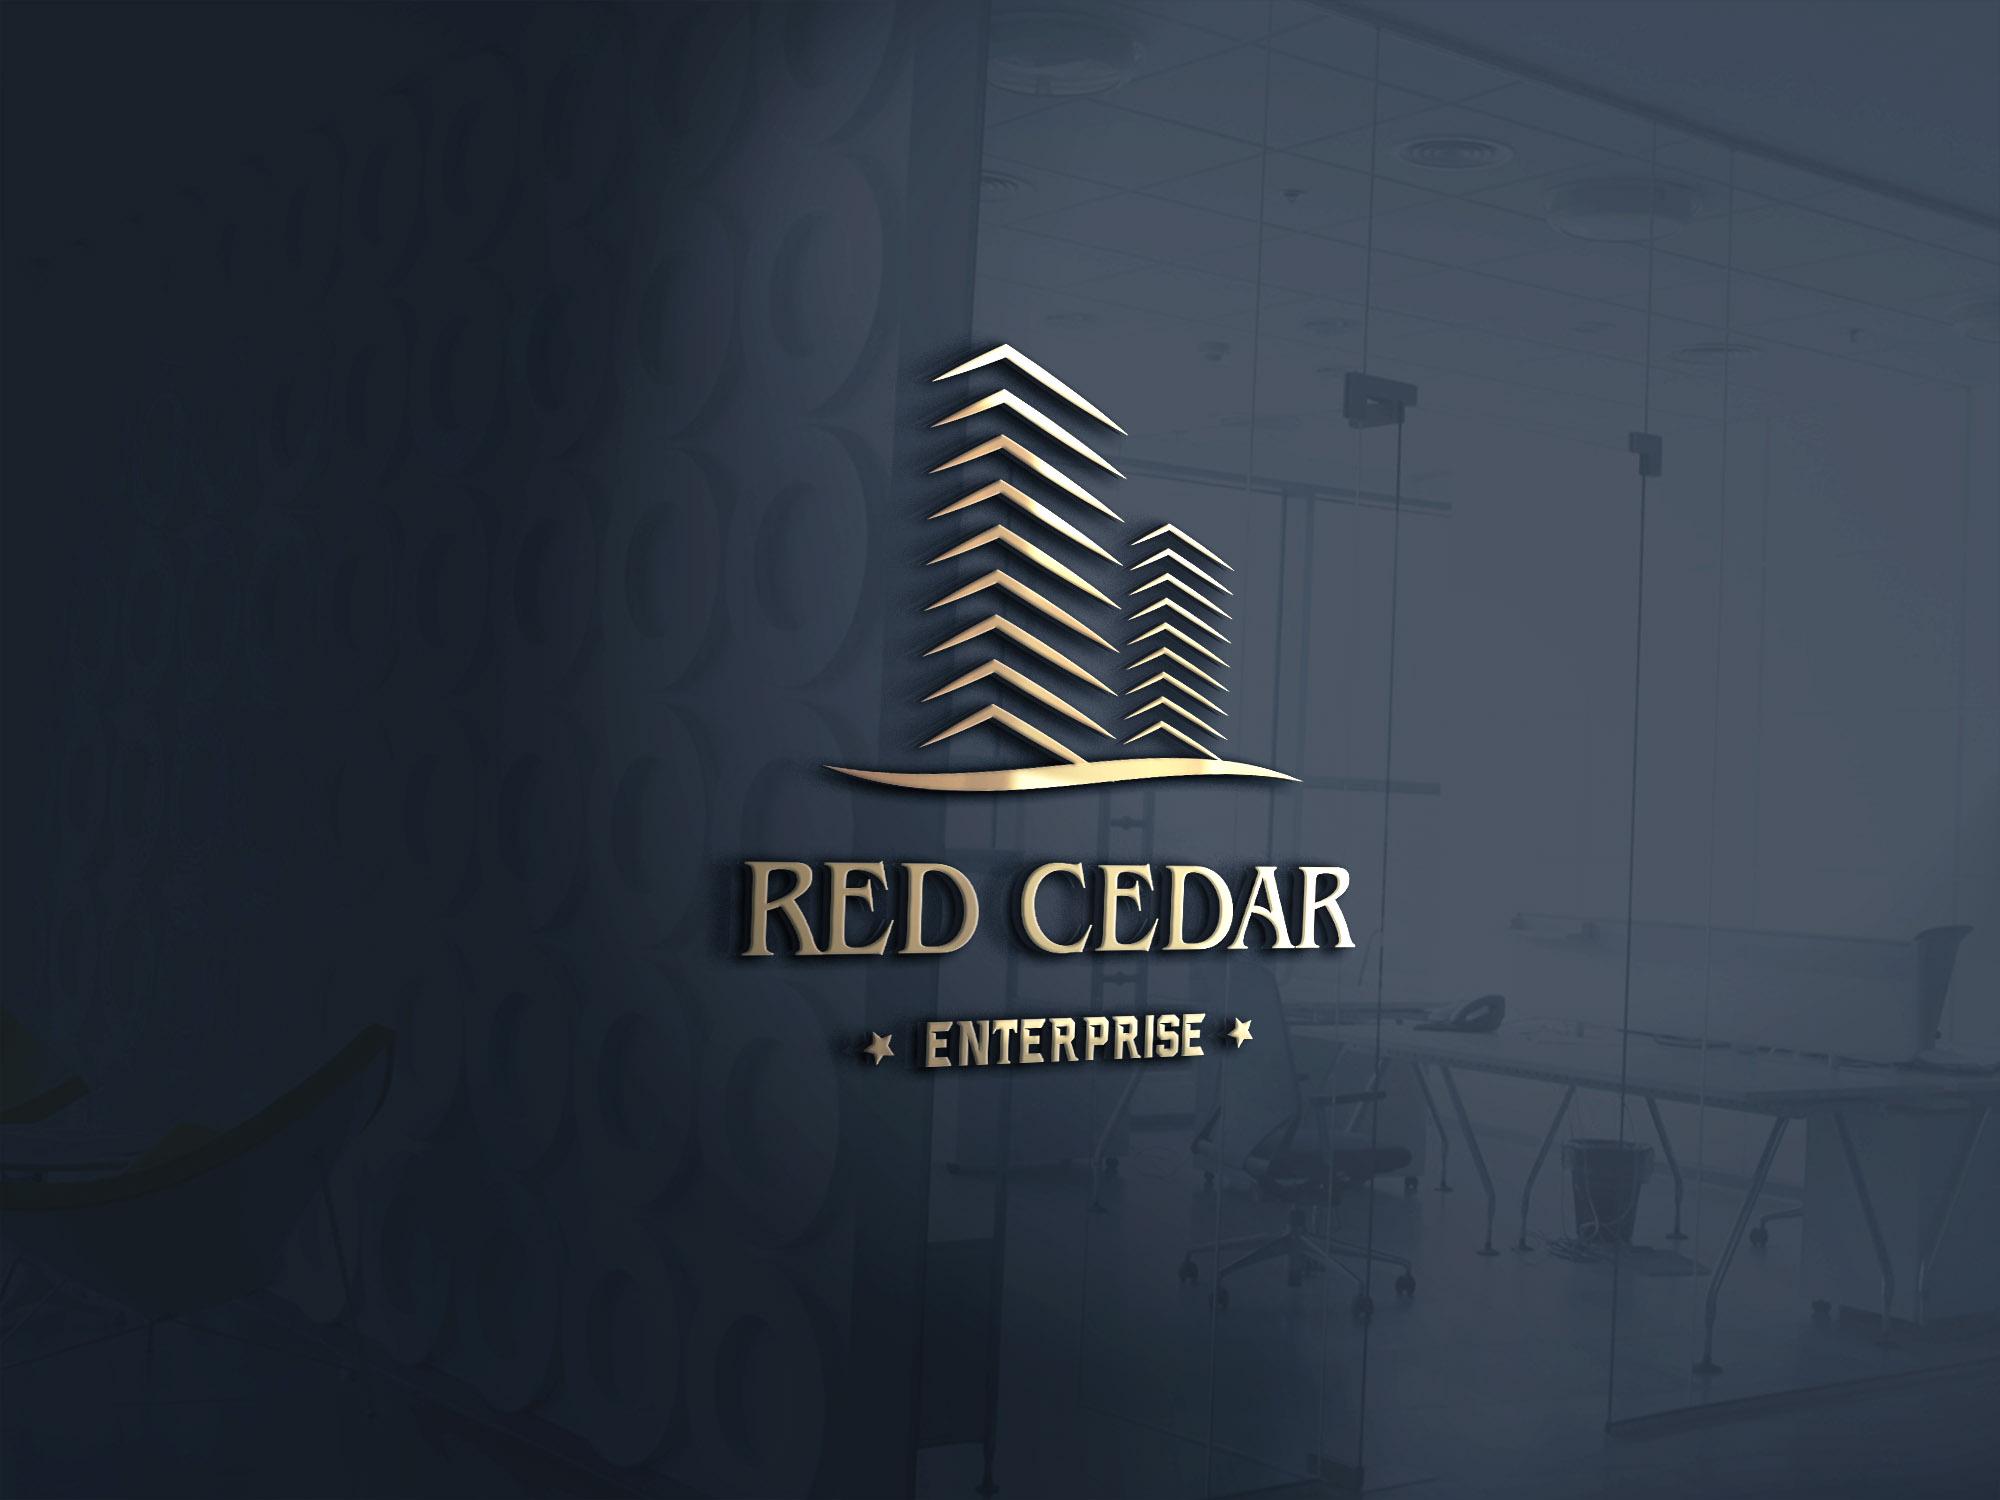 Logo Design by Umair ahmed Iqbal - Entry No. 30 in the Logo Design Contest Unique Logo Design Wanted for Red Cedar Enterprise.